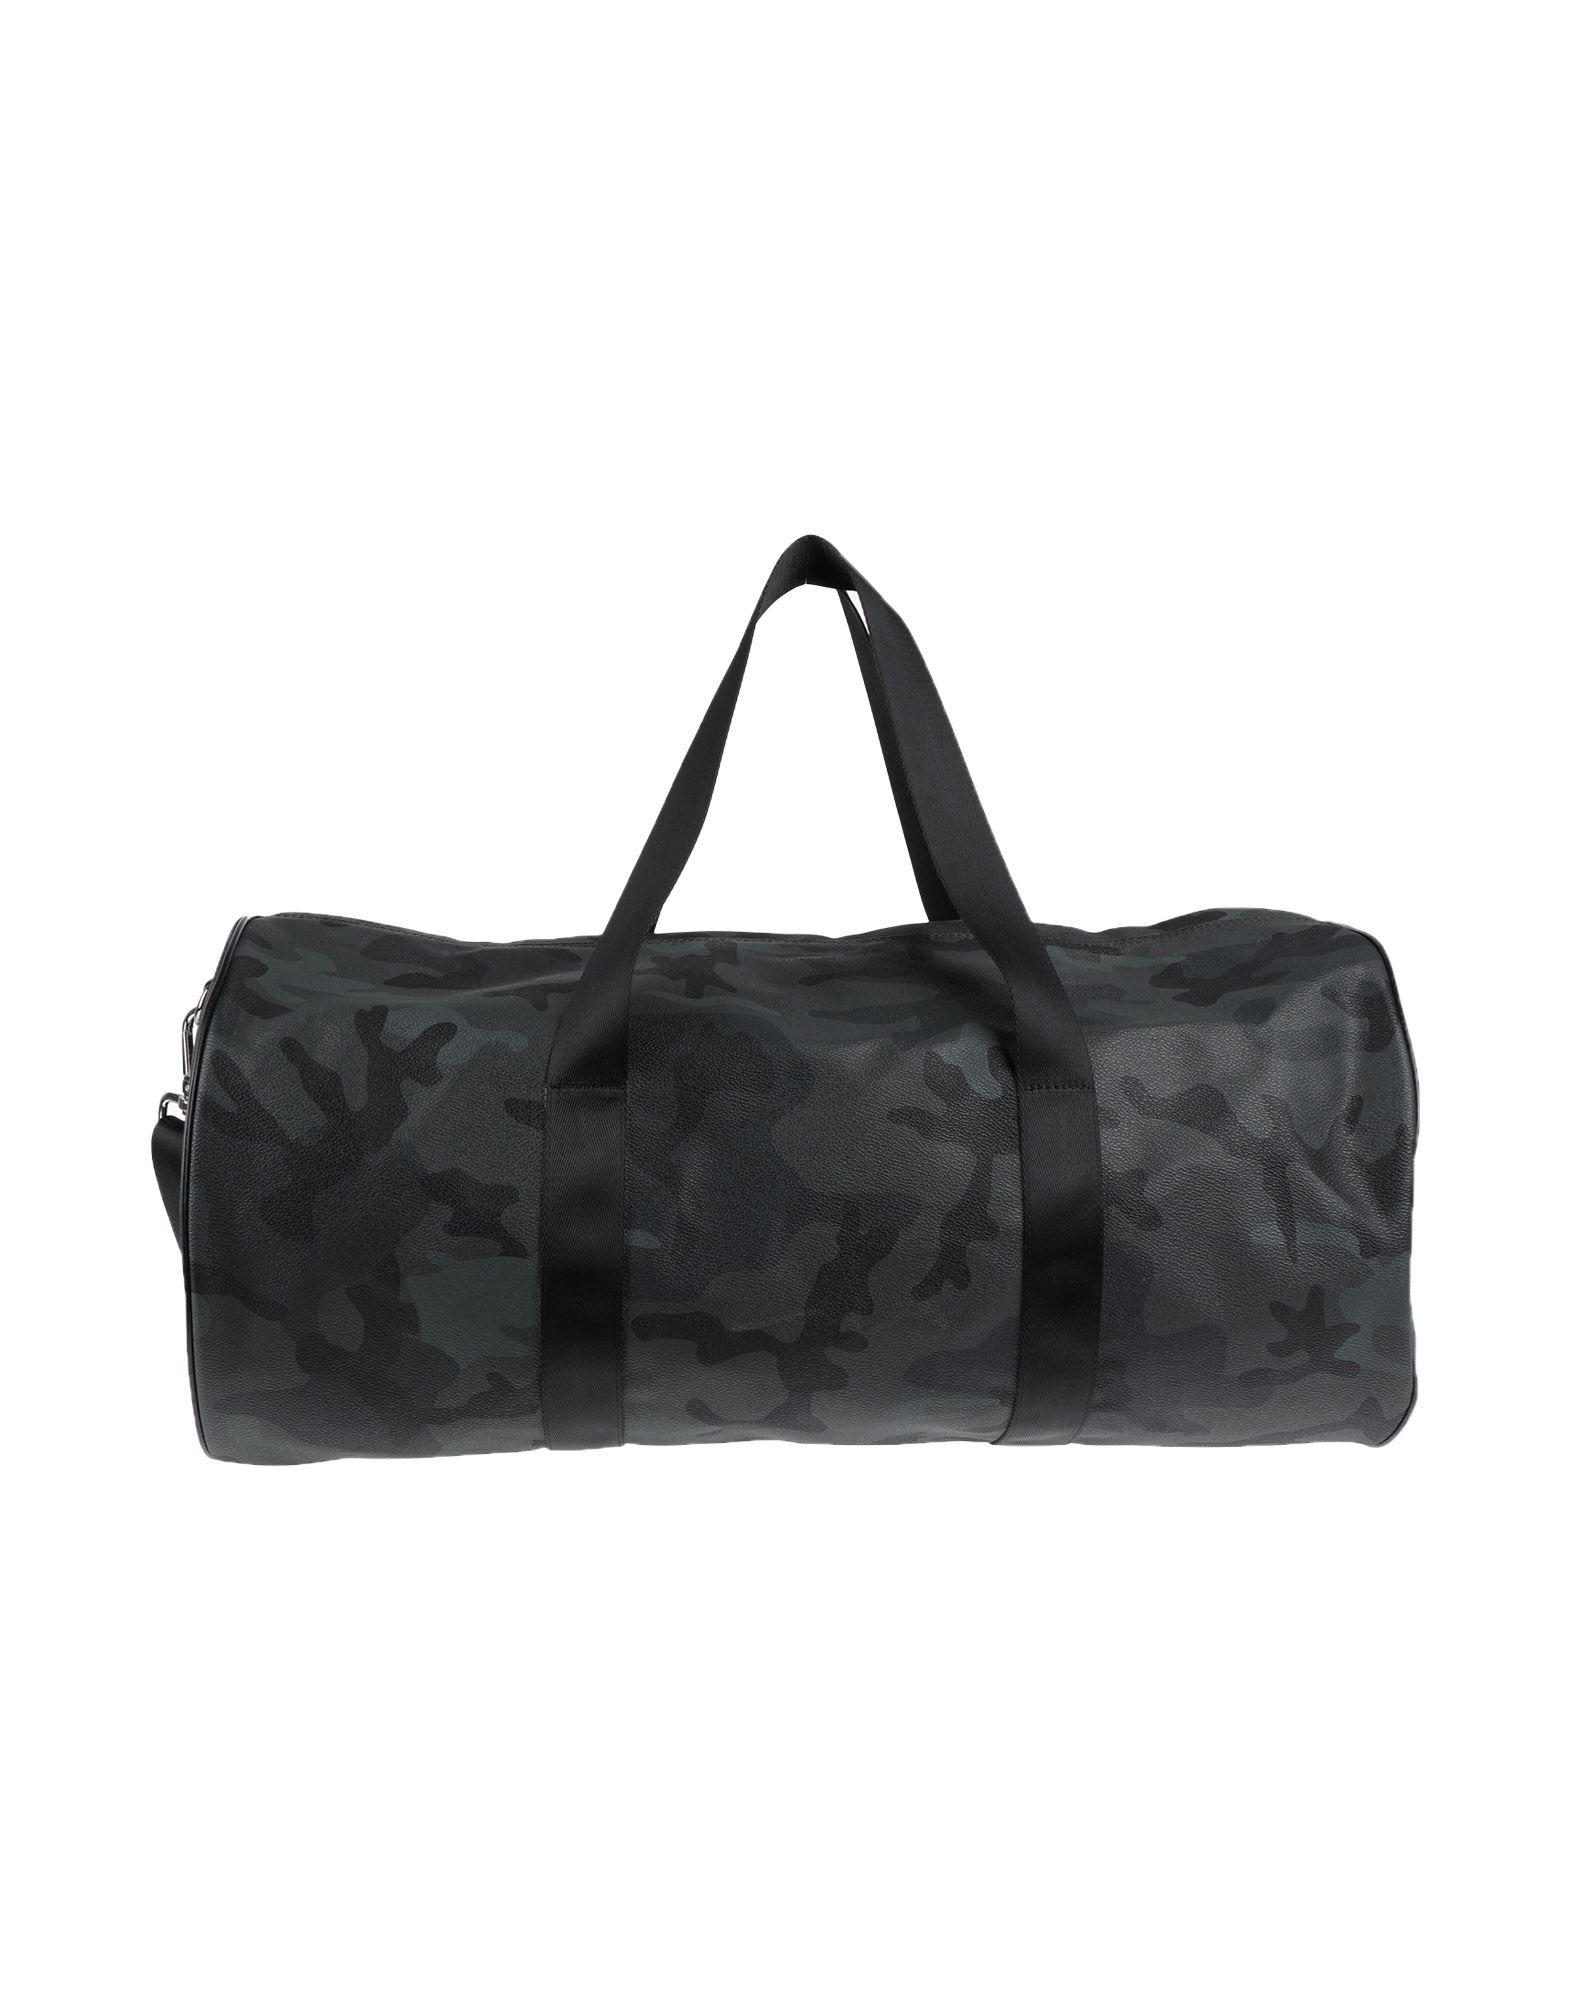 MIA BAG メンズ 旅行バッグ 鉛色